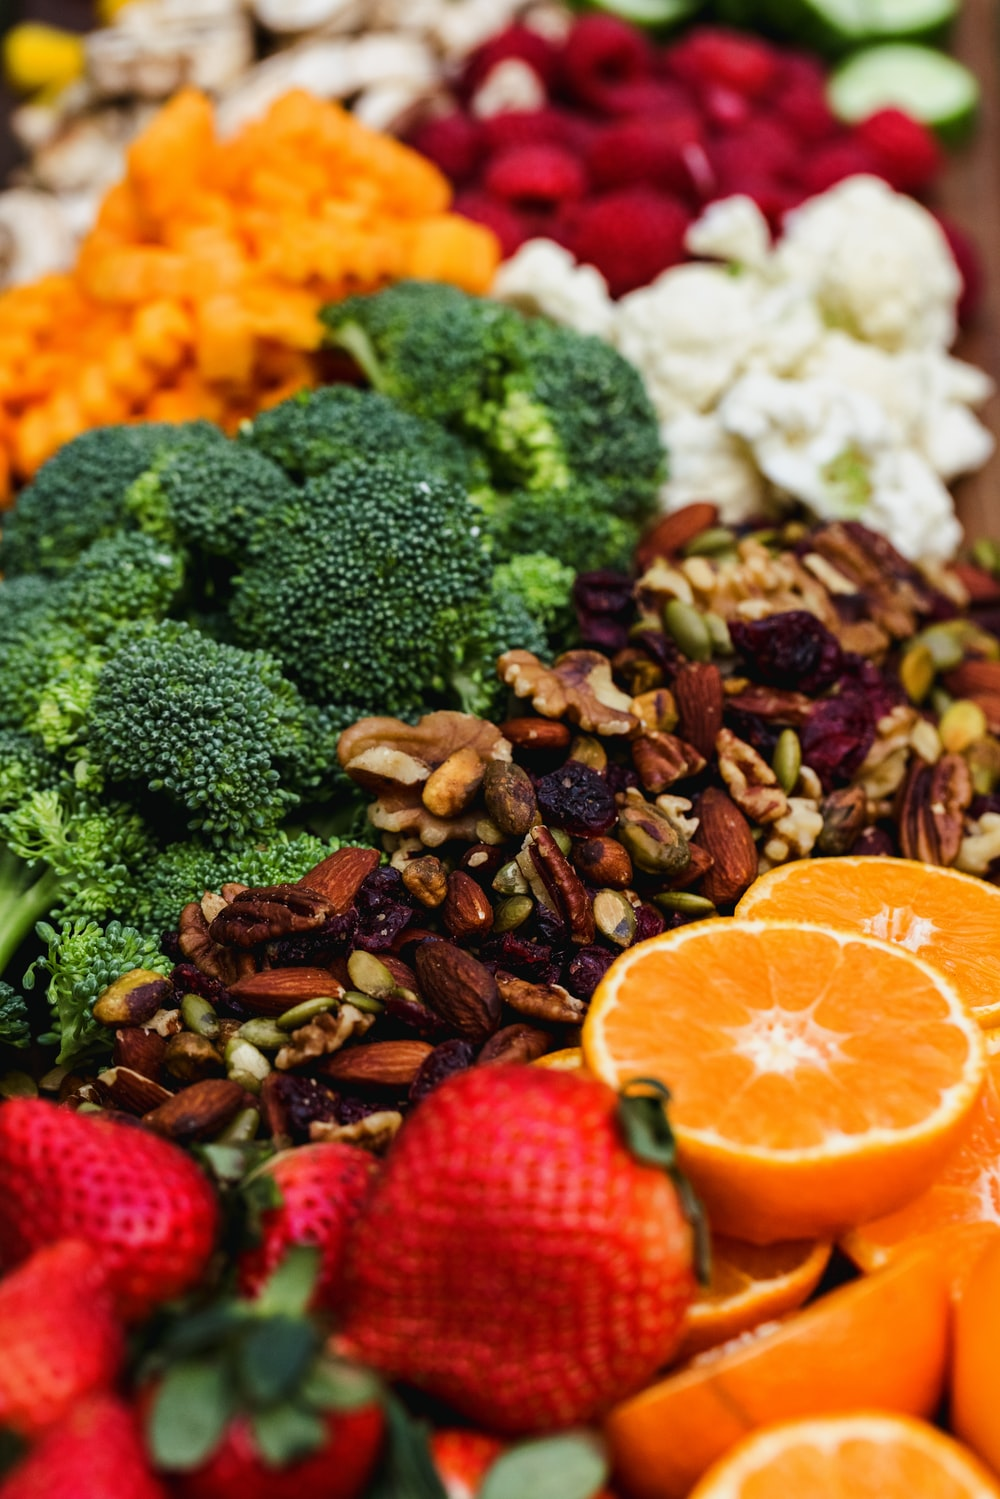 sliced orange fruit and green broccoli